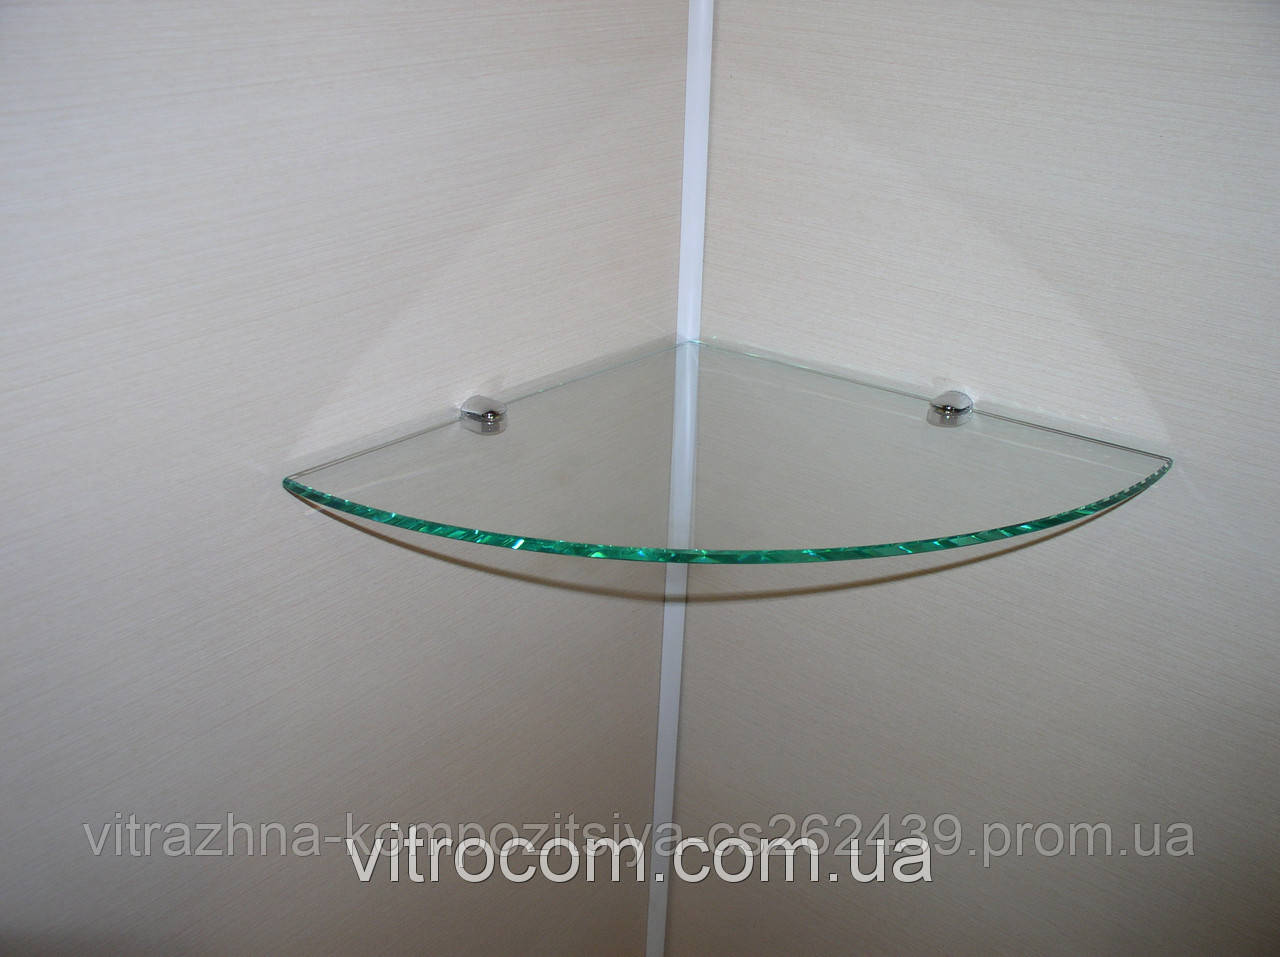 Полка стеклянная угловая 6 мм прозрачная 35 х 35 см